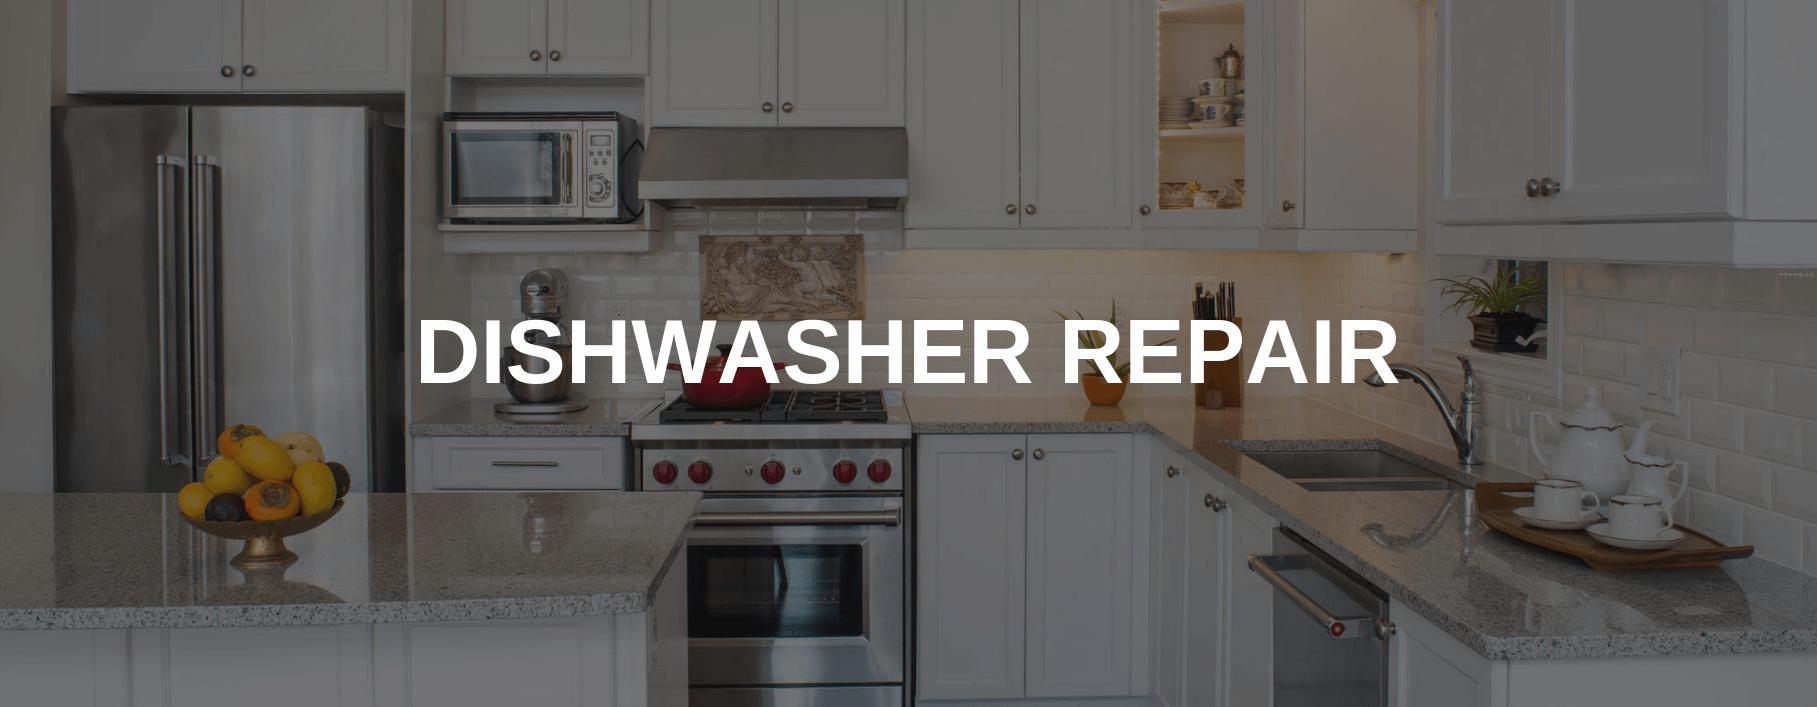 dishwasher repair oceanside